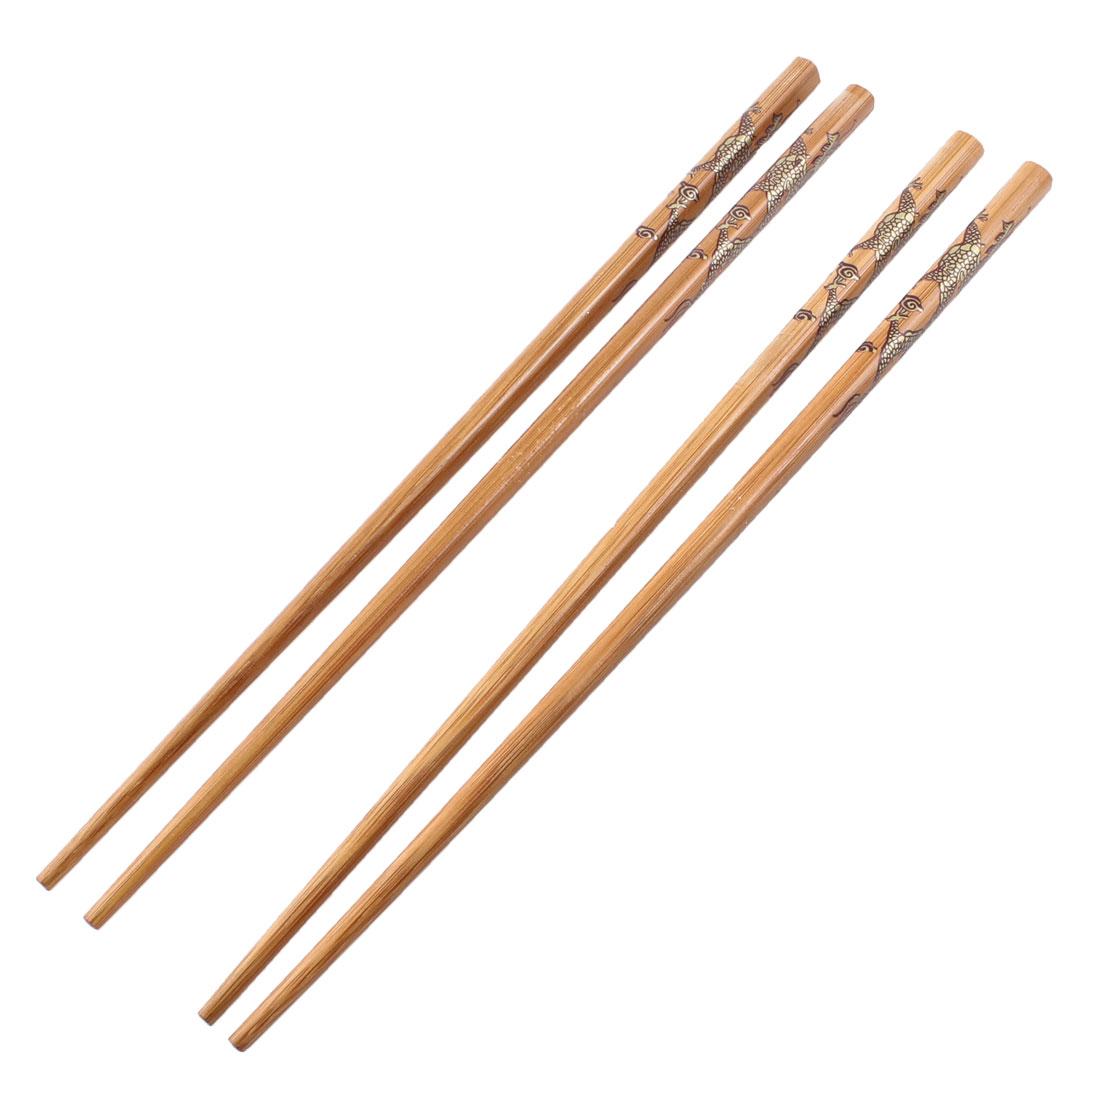 Home Brown Round Tip Wooden Chopsticks Tableware Dargon Printed 2 Pairs